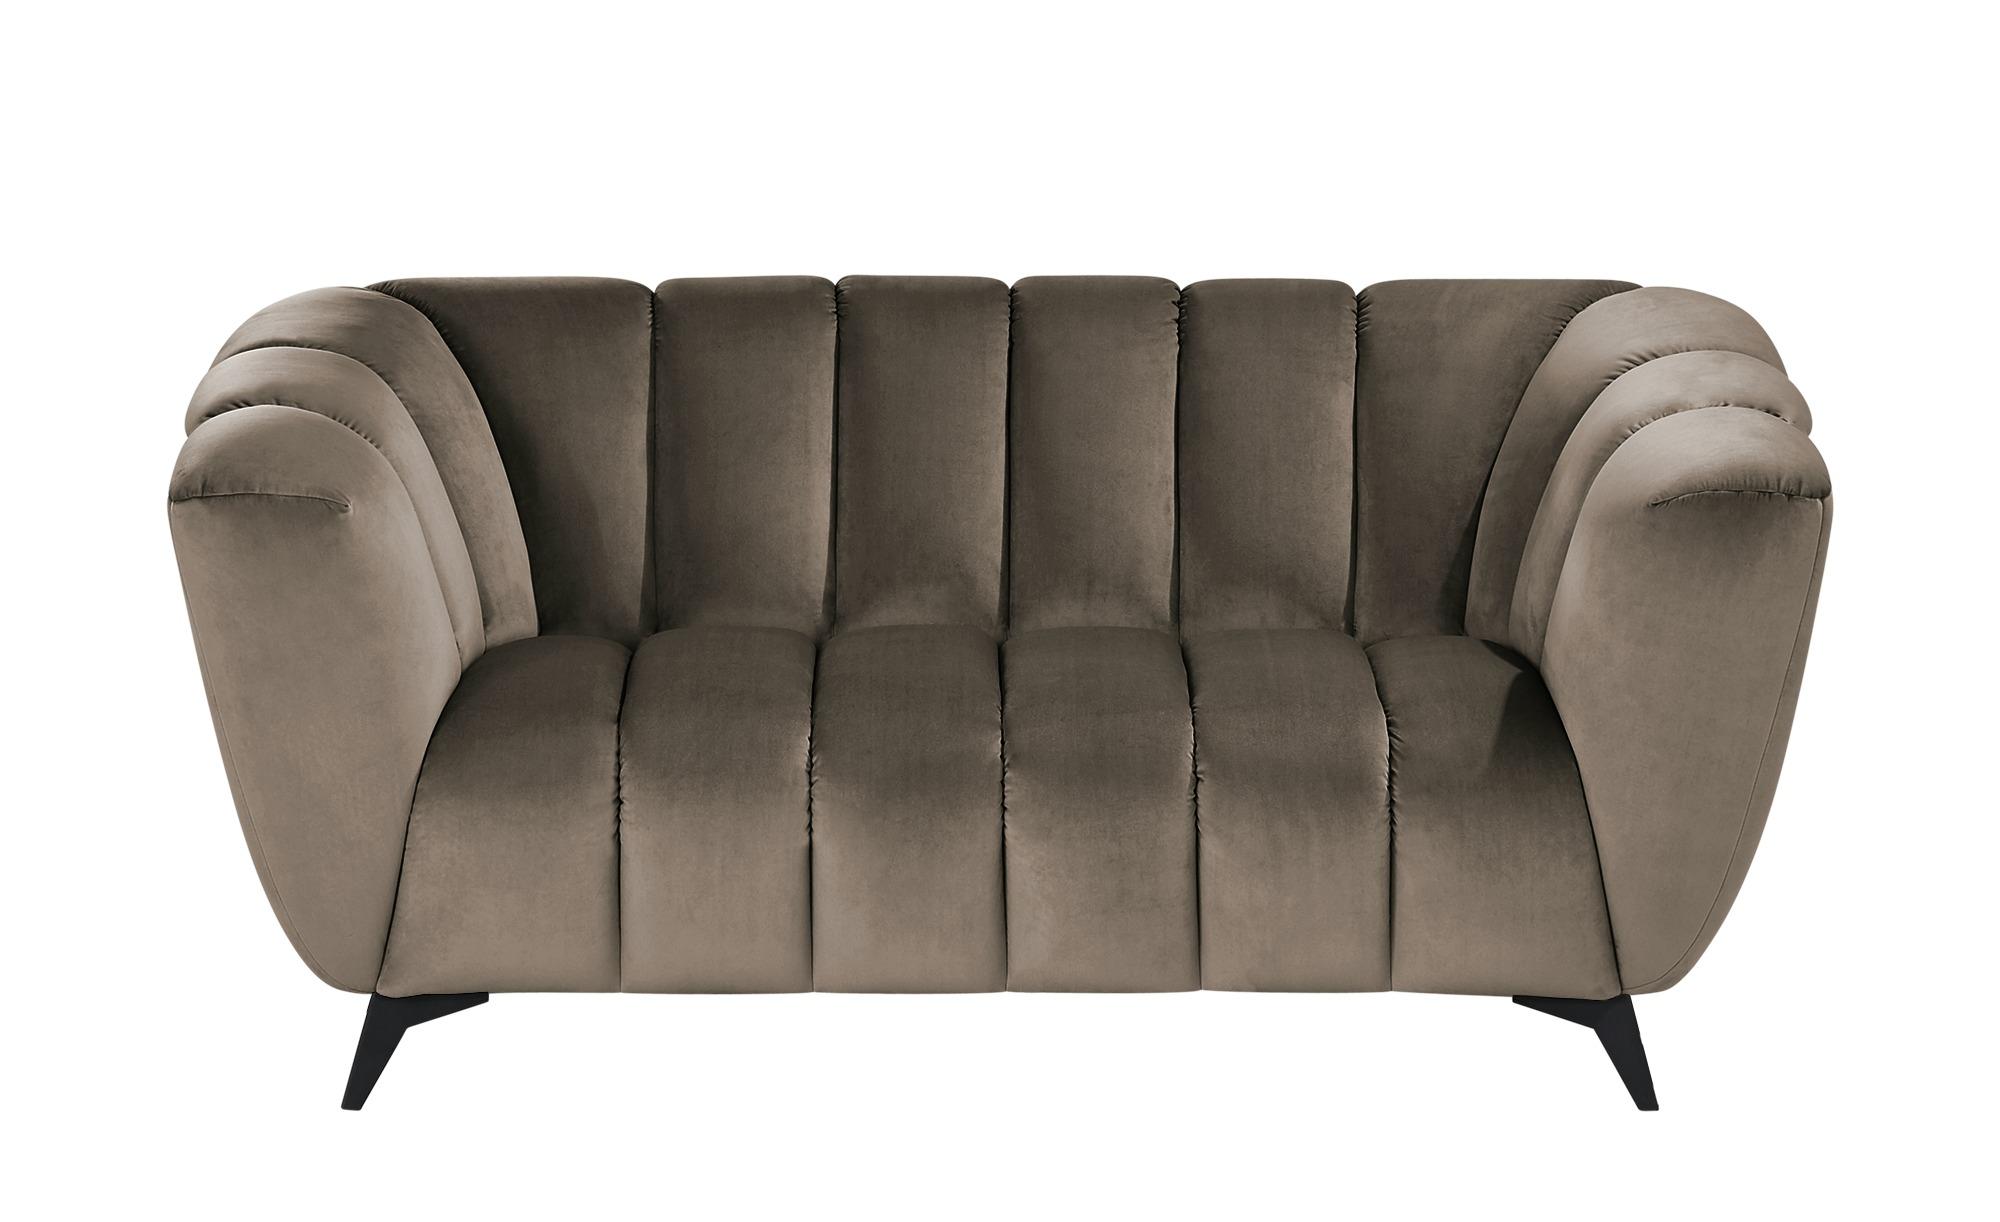 Sofa  Samantha ¦ braun ¦ Maße (cm): B: 180 H: 86 T: 100 Polstermöbel > Sofas > 2-Sitzer - Höffner